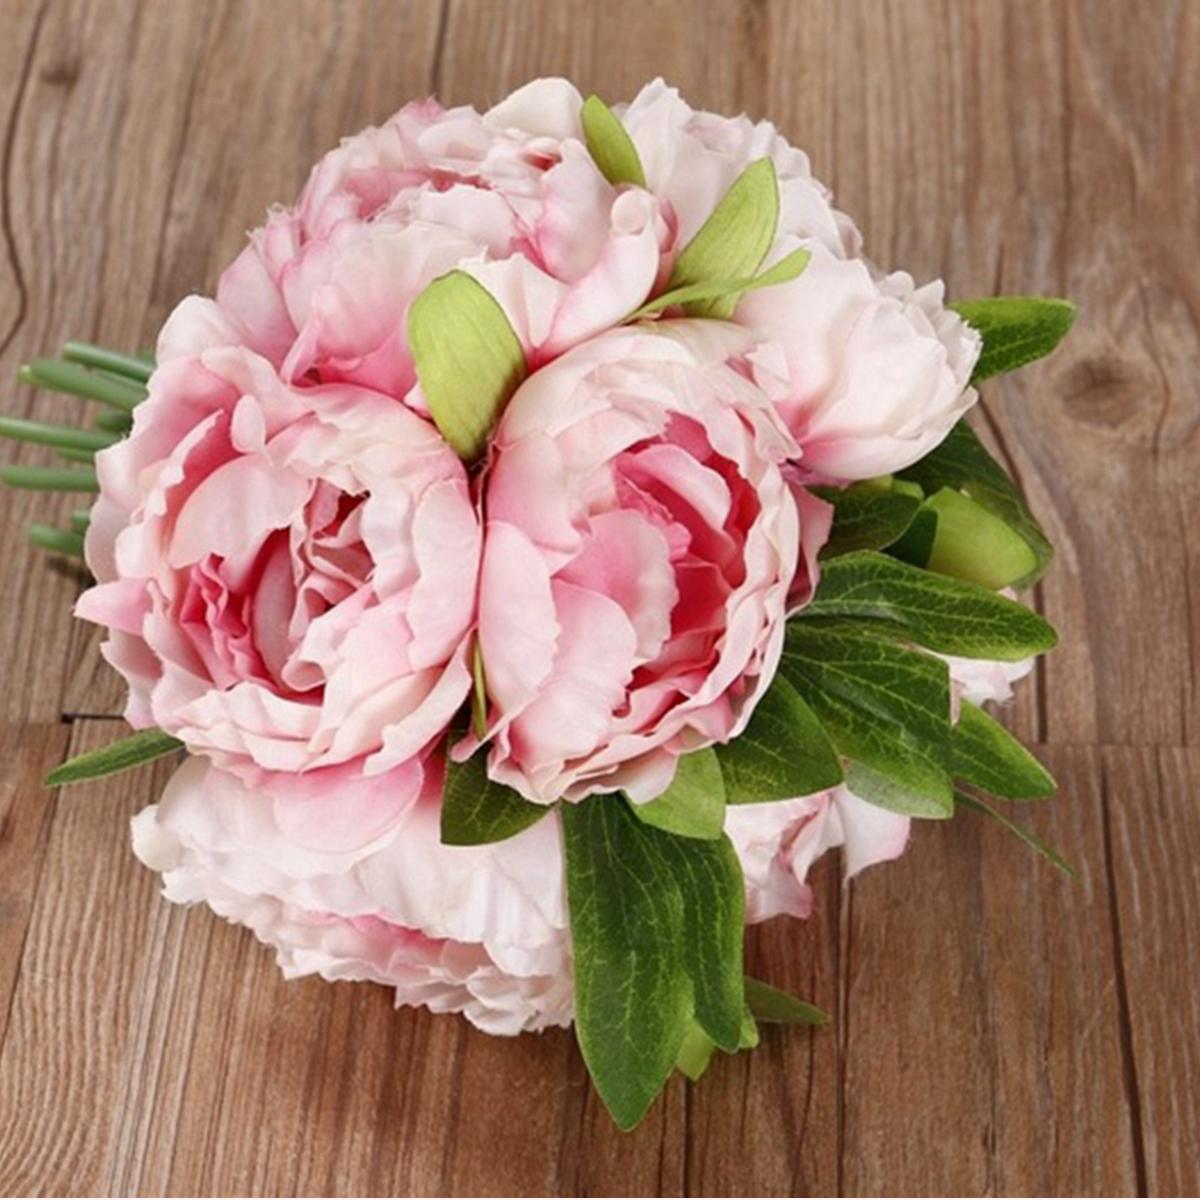 Bouquet 5 Heads Peony Flower